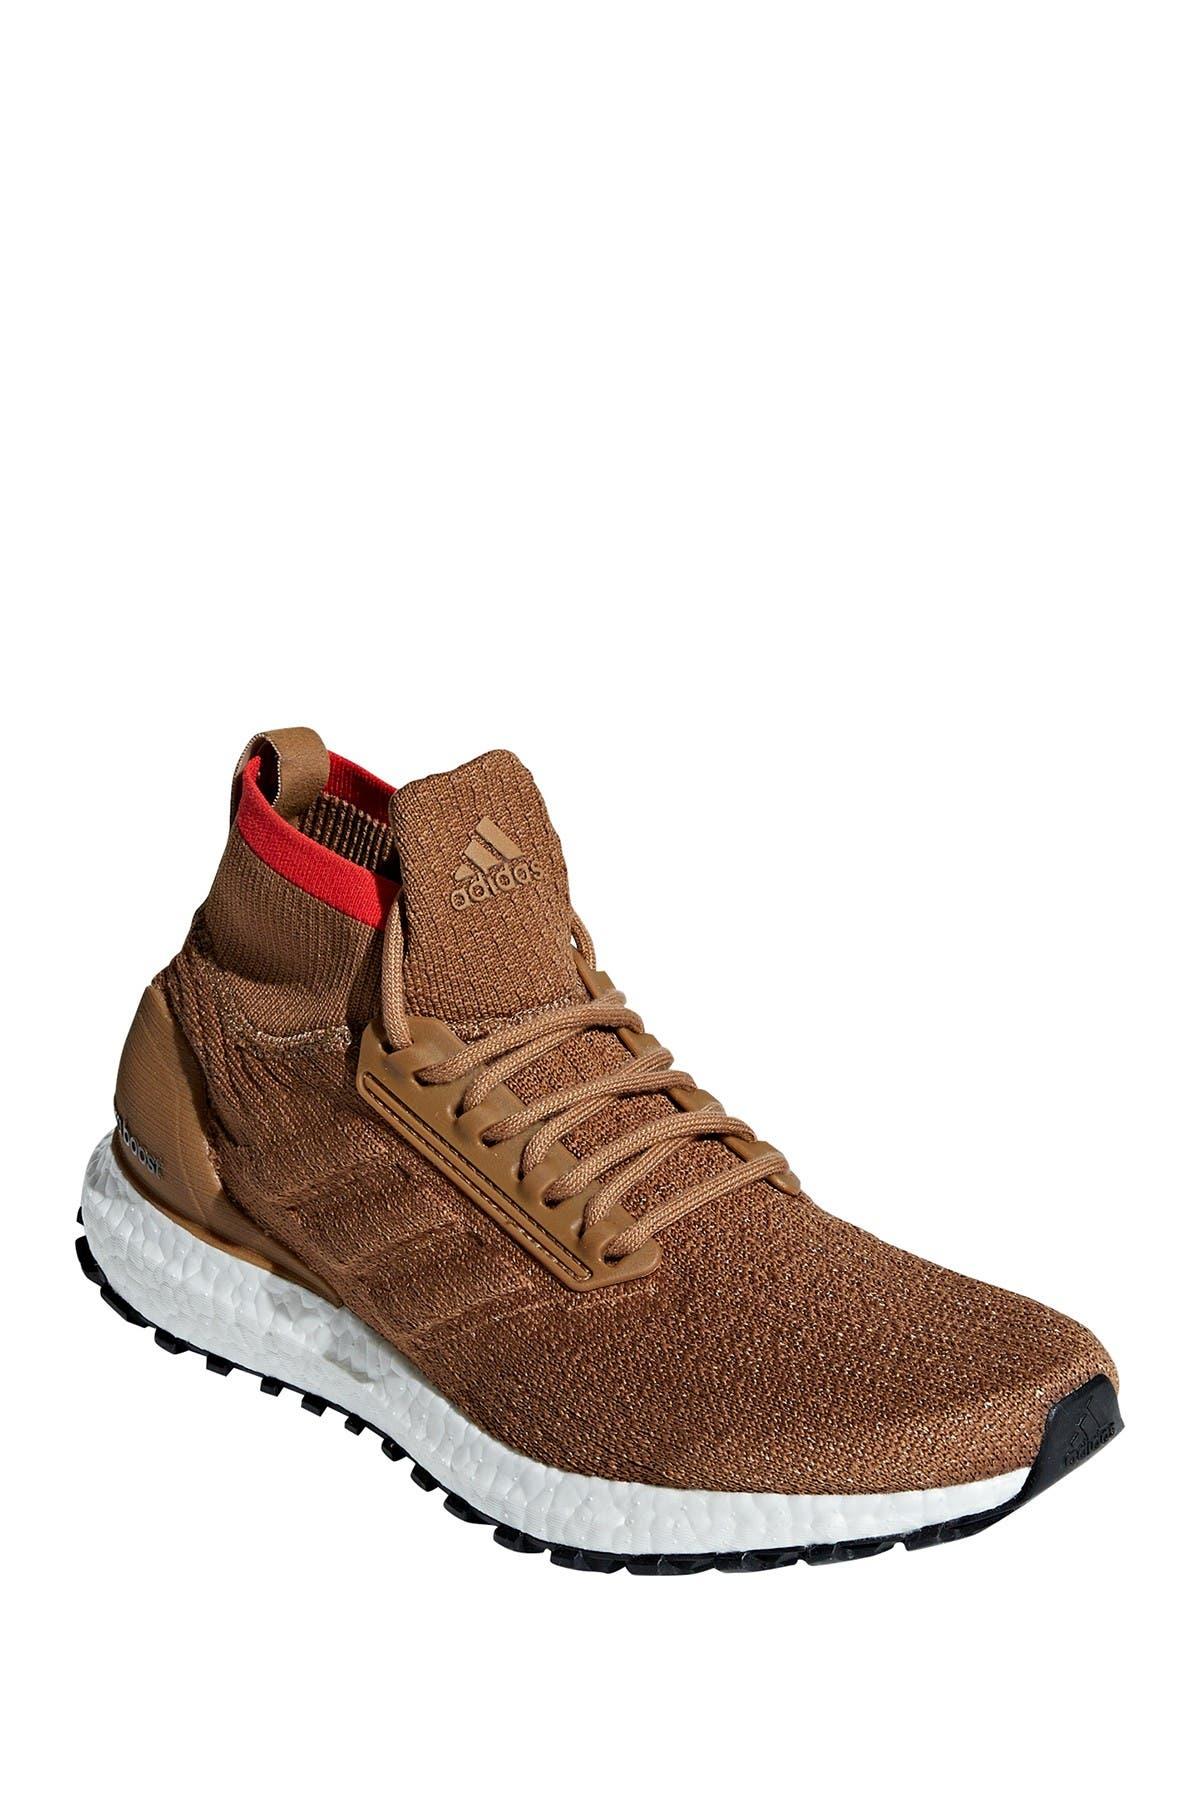 adidas | Ultraboost All Terrain Running